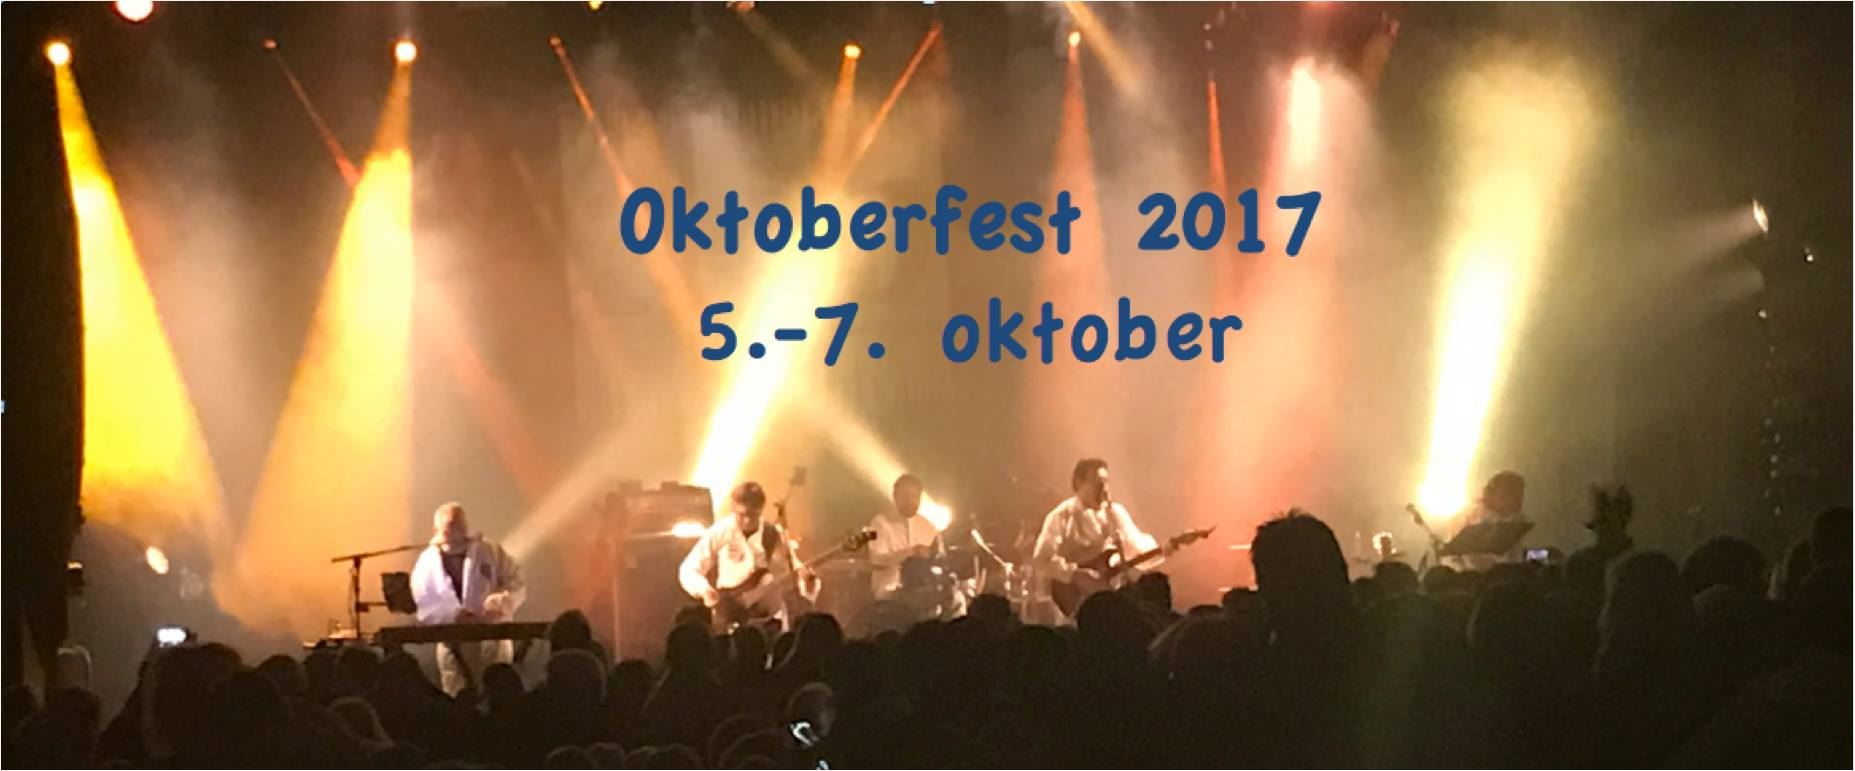 Oktoberfest iBrønnøy